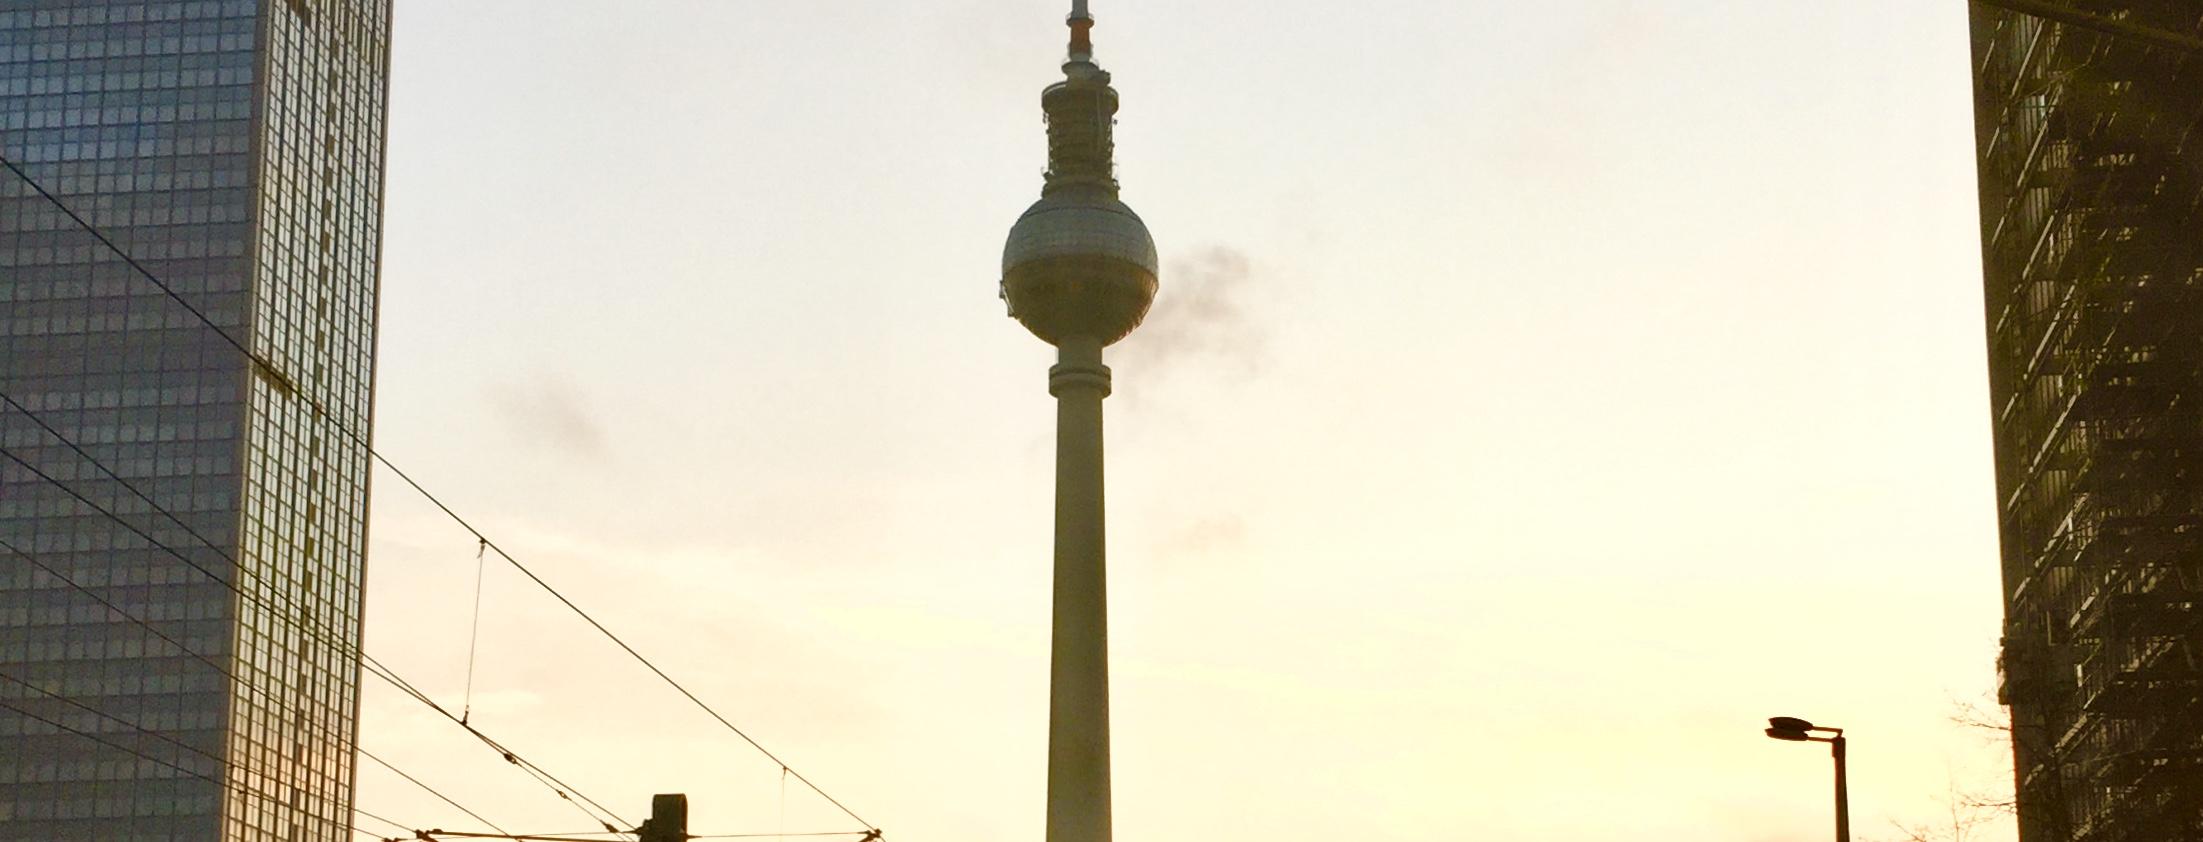 Nostalgie-Fotobox Berlin